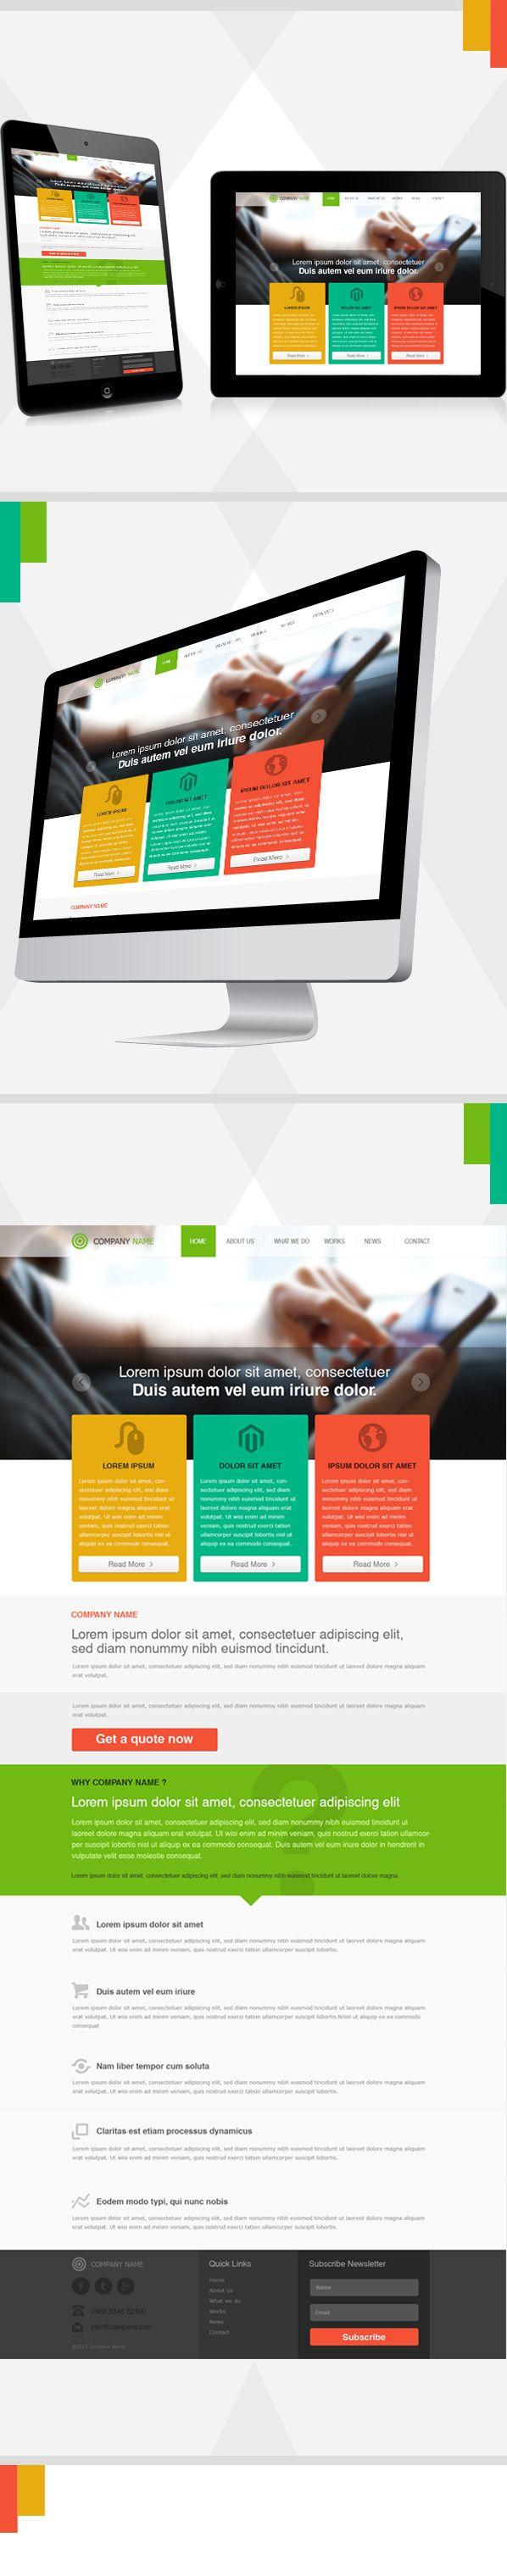 Design Template by Monish , via Behance